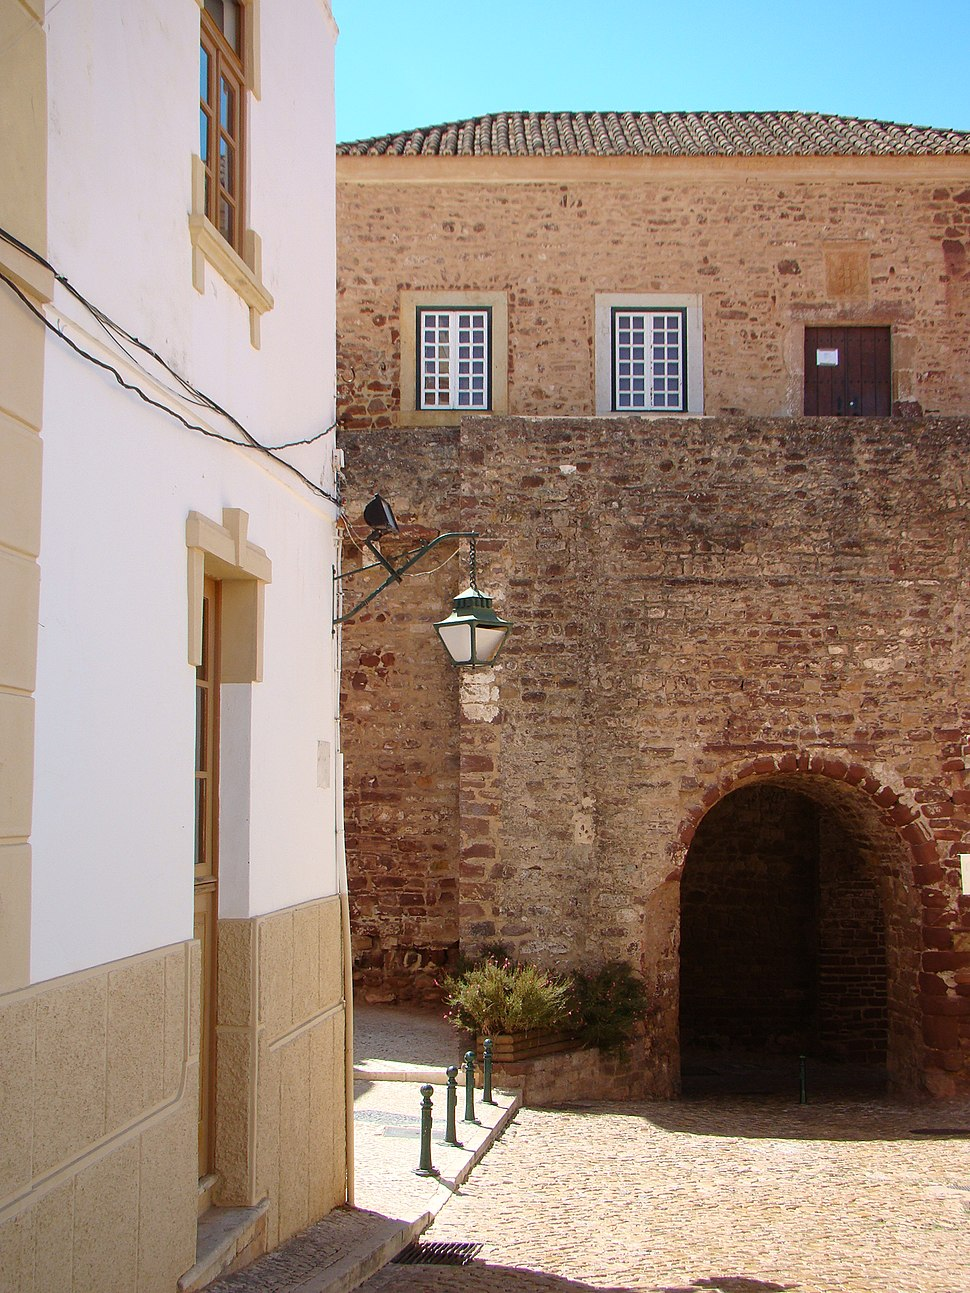 Rua de Silves